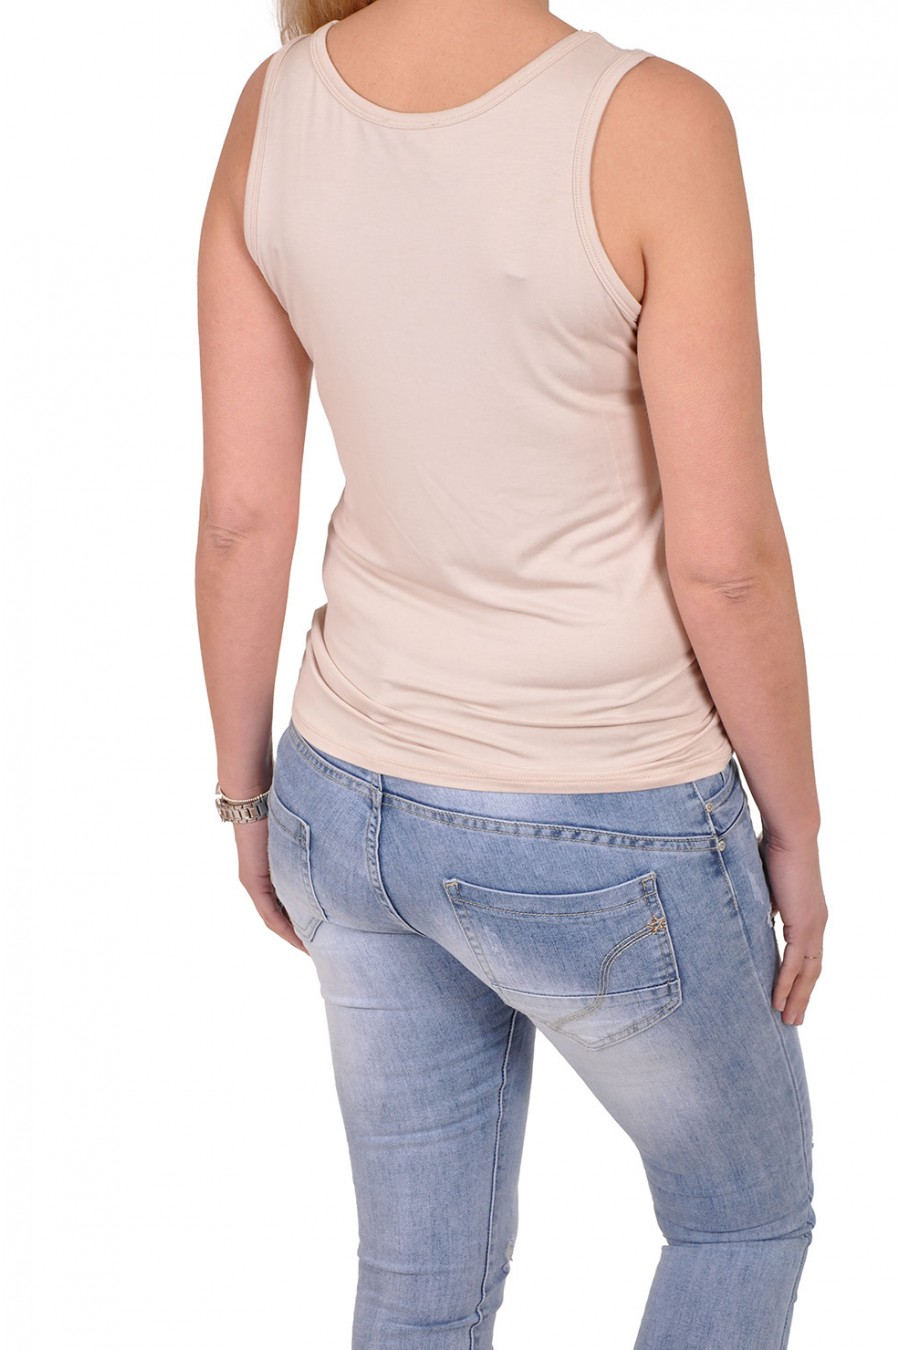 Basic topje want-it beige Italia Moda